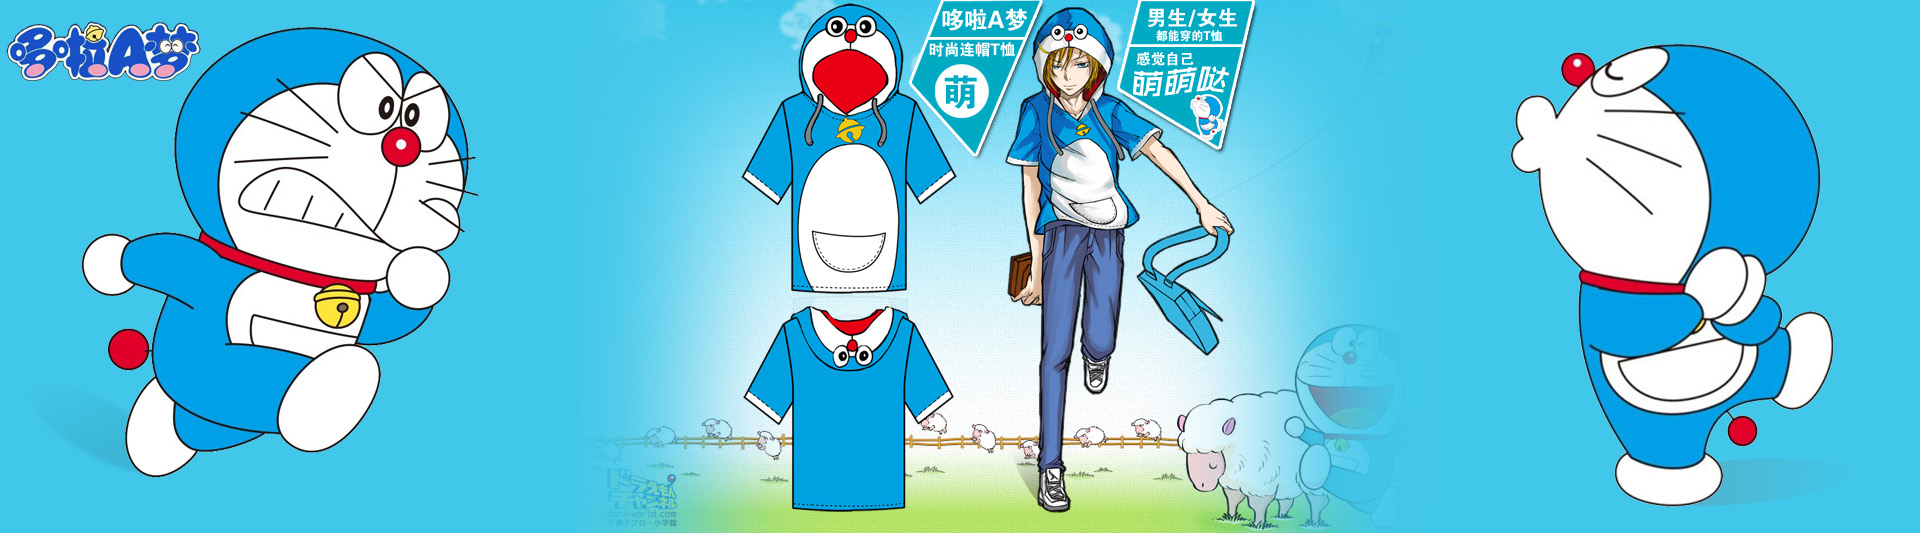 Áo thun trùm đầu Doraemon